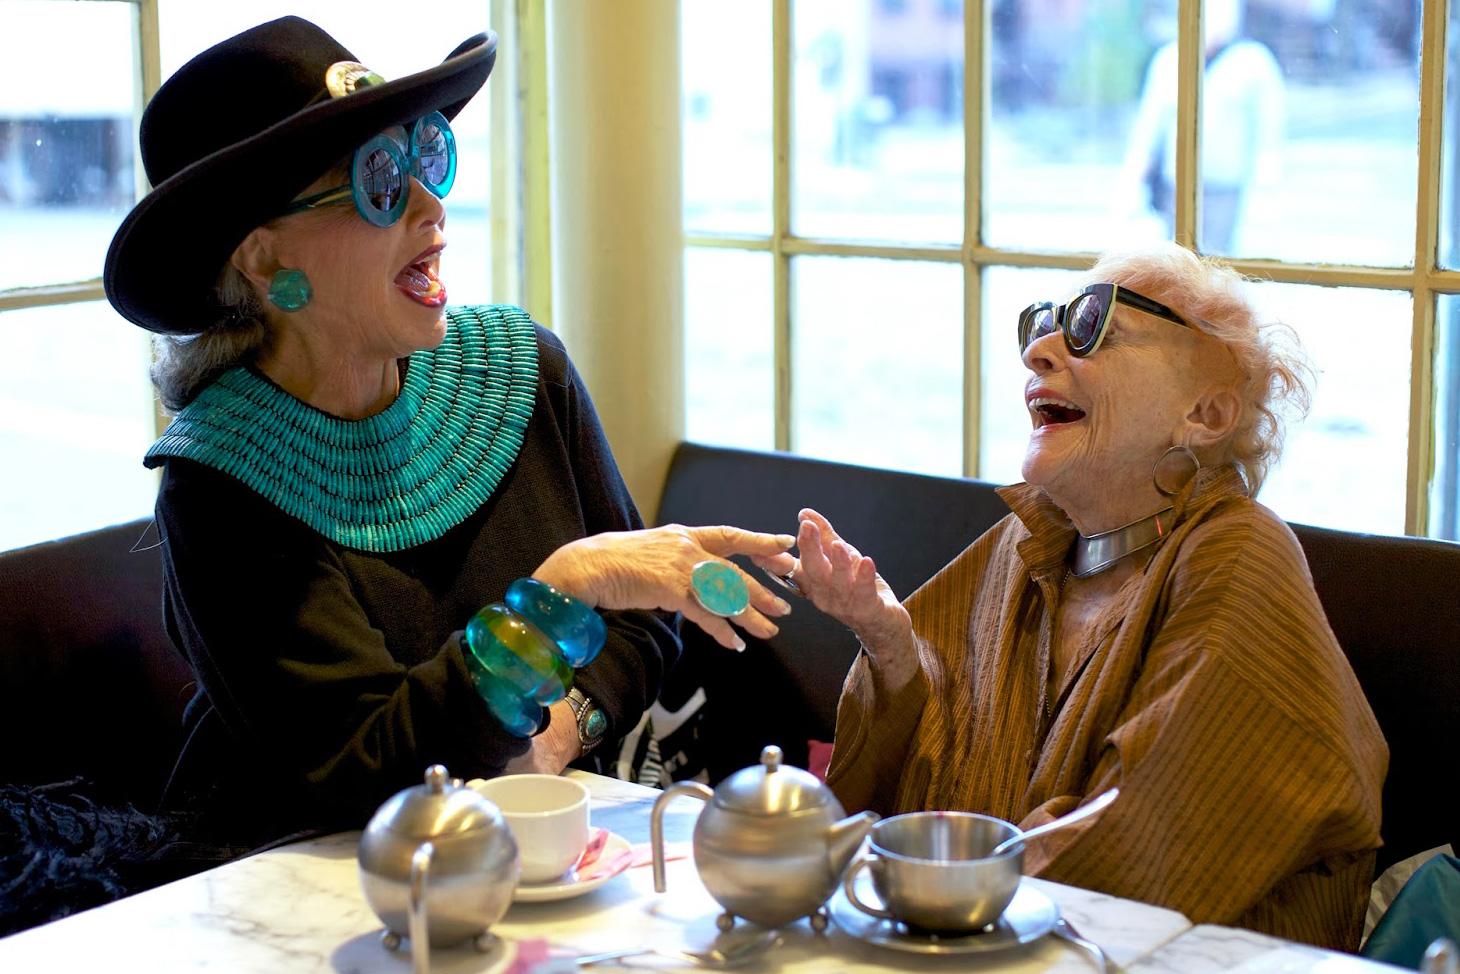 3036213 slide s 10 a new documentary shows elderly style mavens as walking works of art